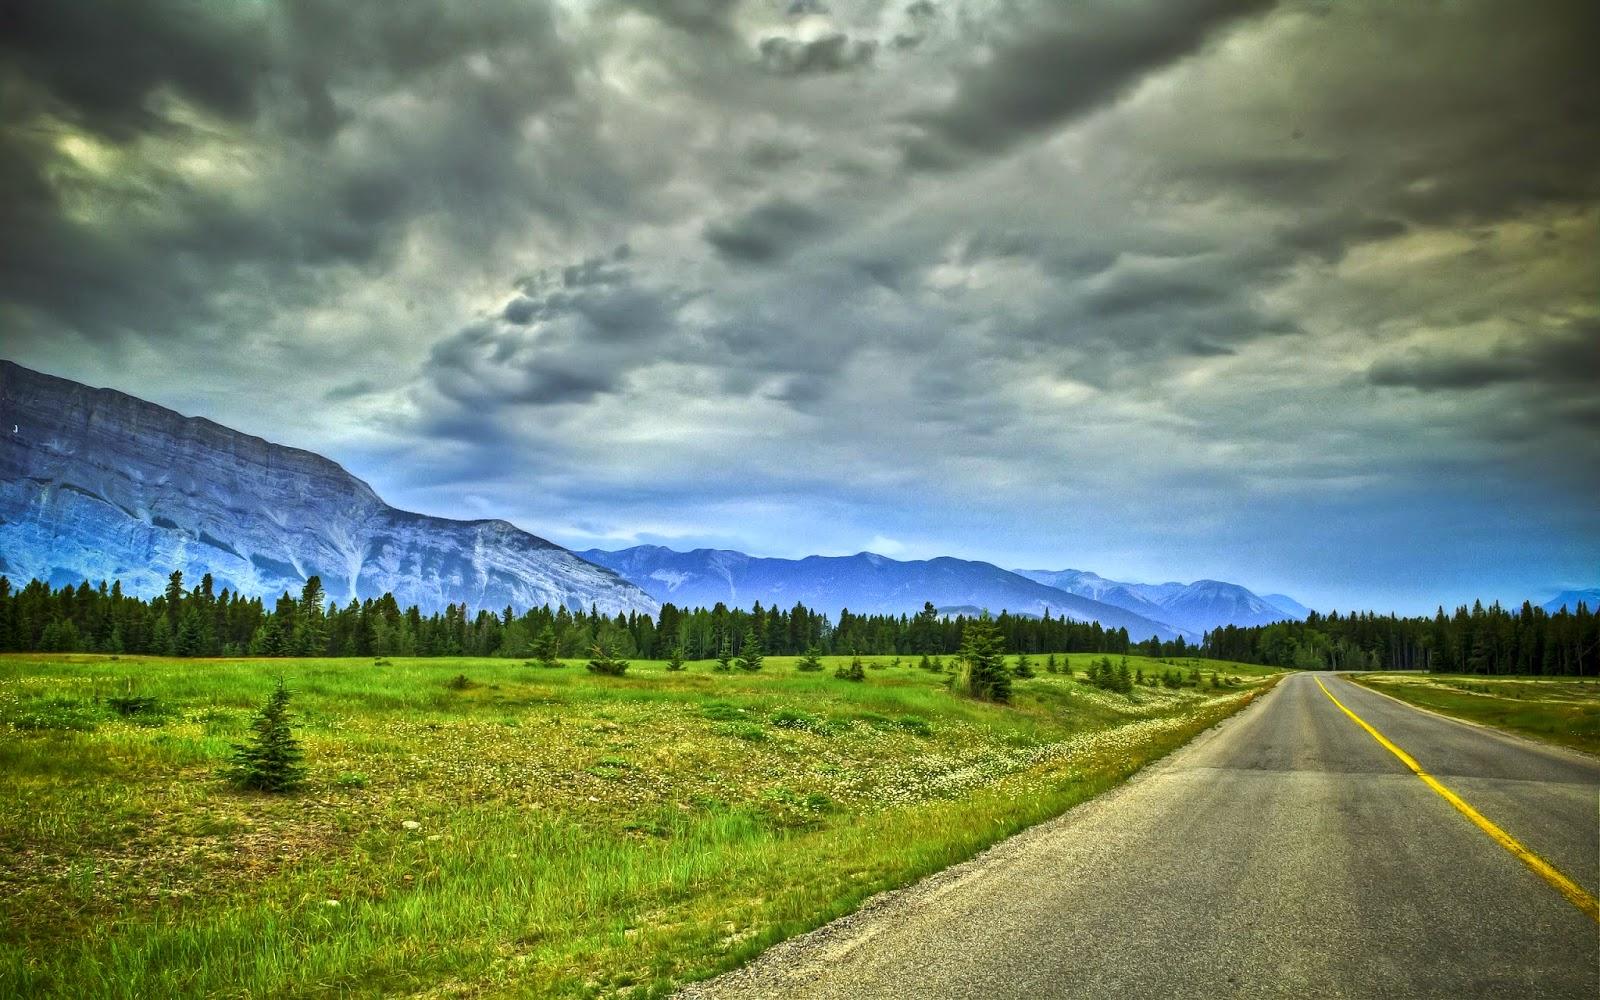 Road Widescreen